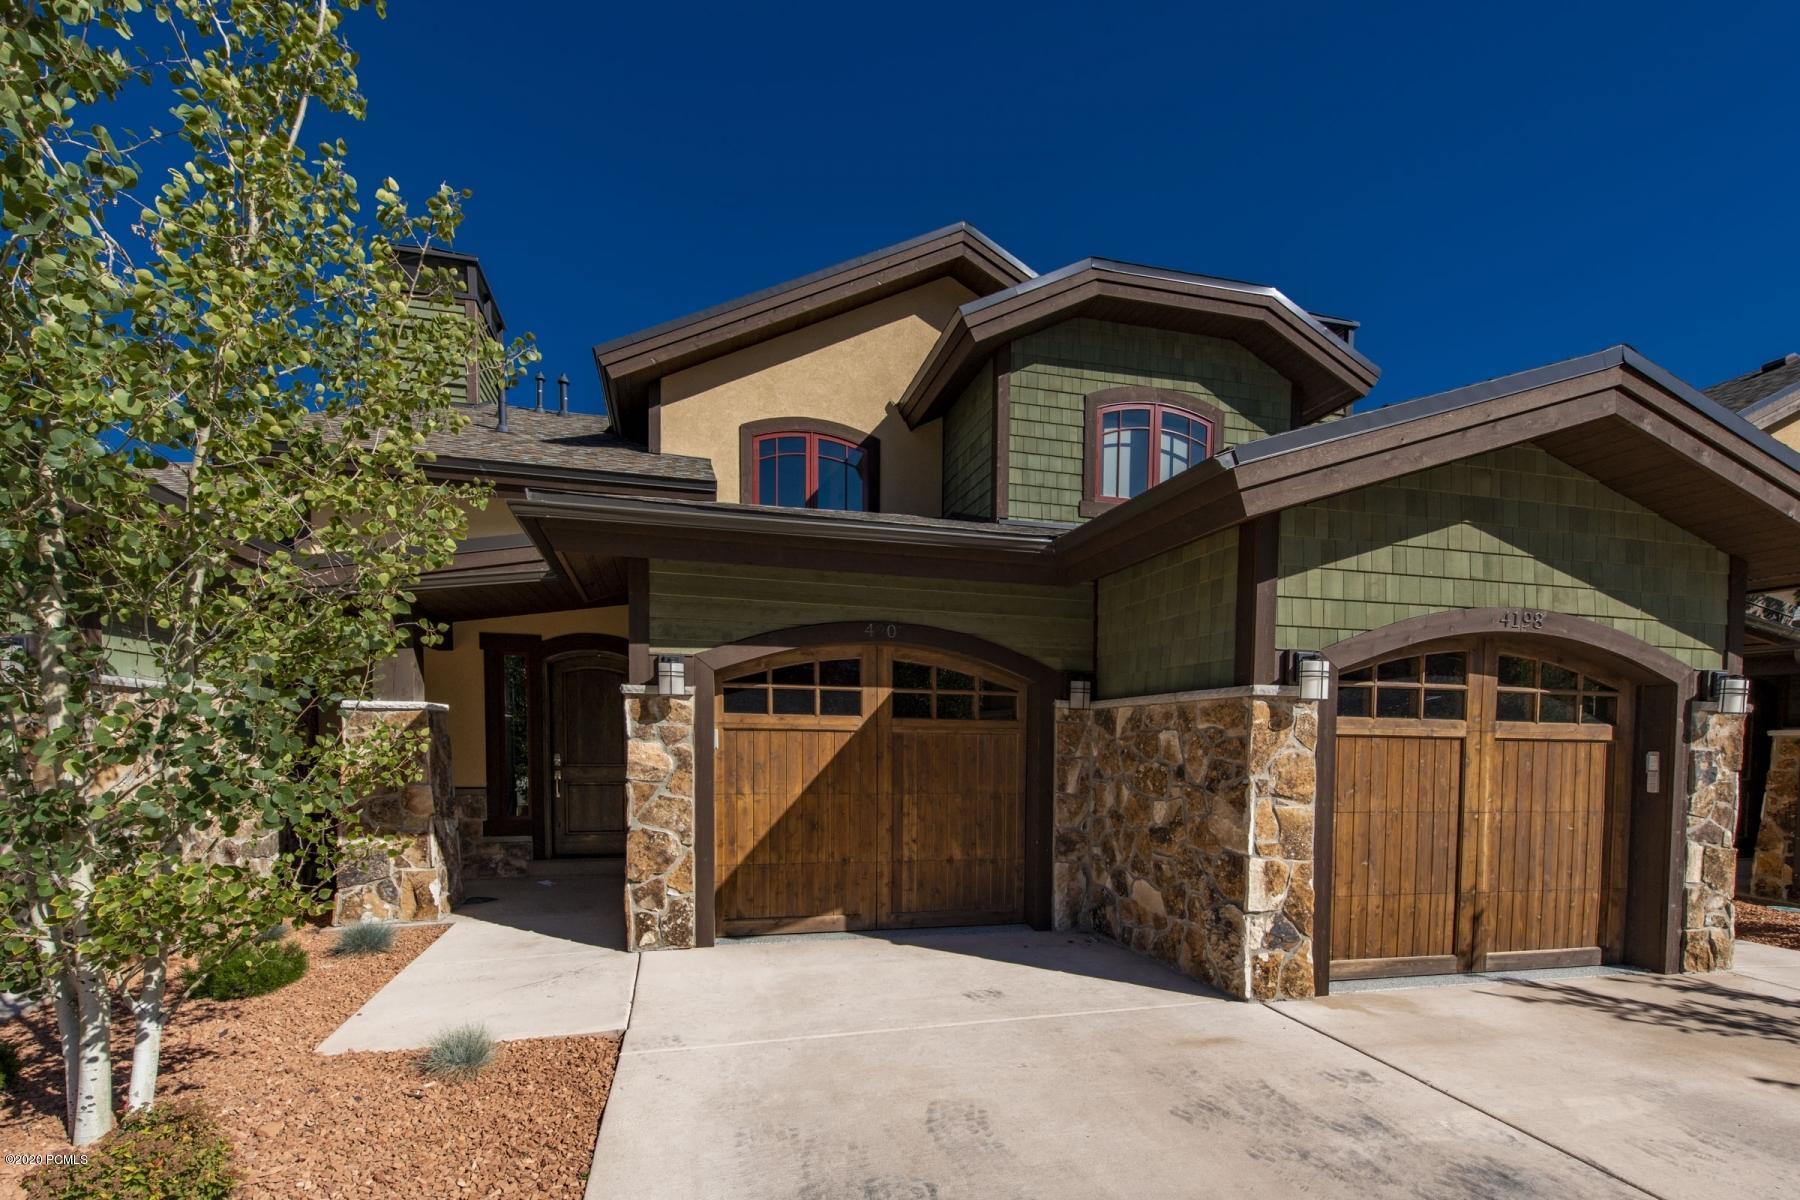 4164 Fairway Lane, Park City, Utah 84098, 3 Bedrooms Bedrooms, ,3 BathroomsBathrooms,Condominium,For Sale,Fairway,11907782